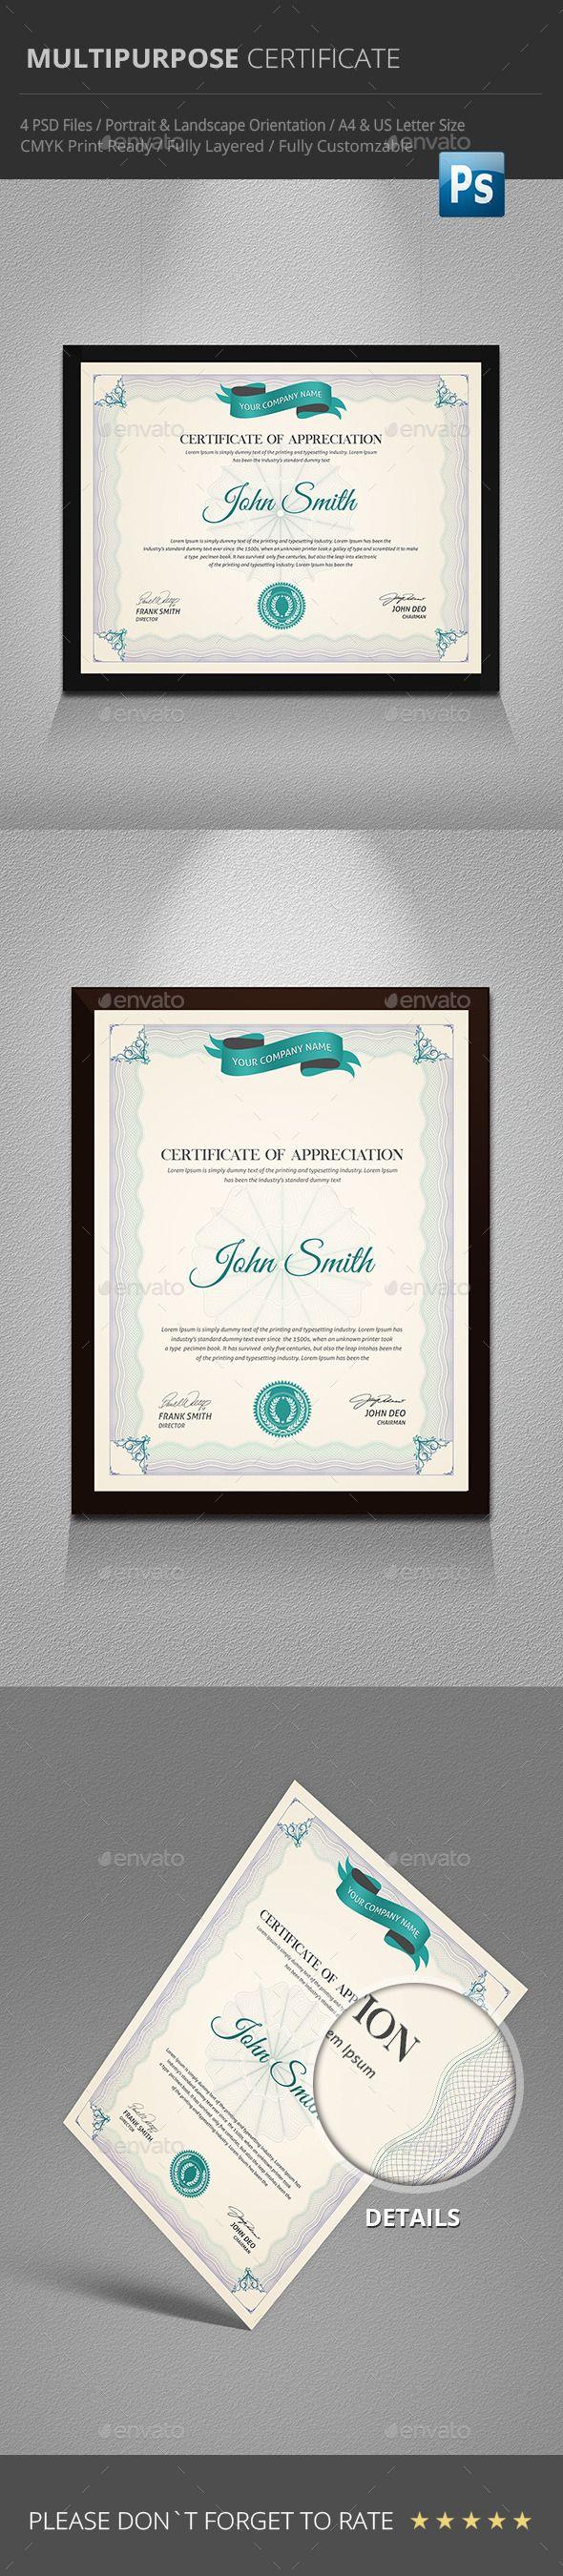 Multipurpose Certificate Template PSD. Download here: http://graphicriver.net/item/multipurpose-certificate/9691616?ref=ksioks